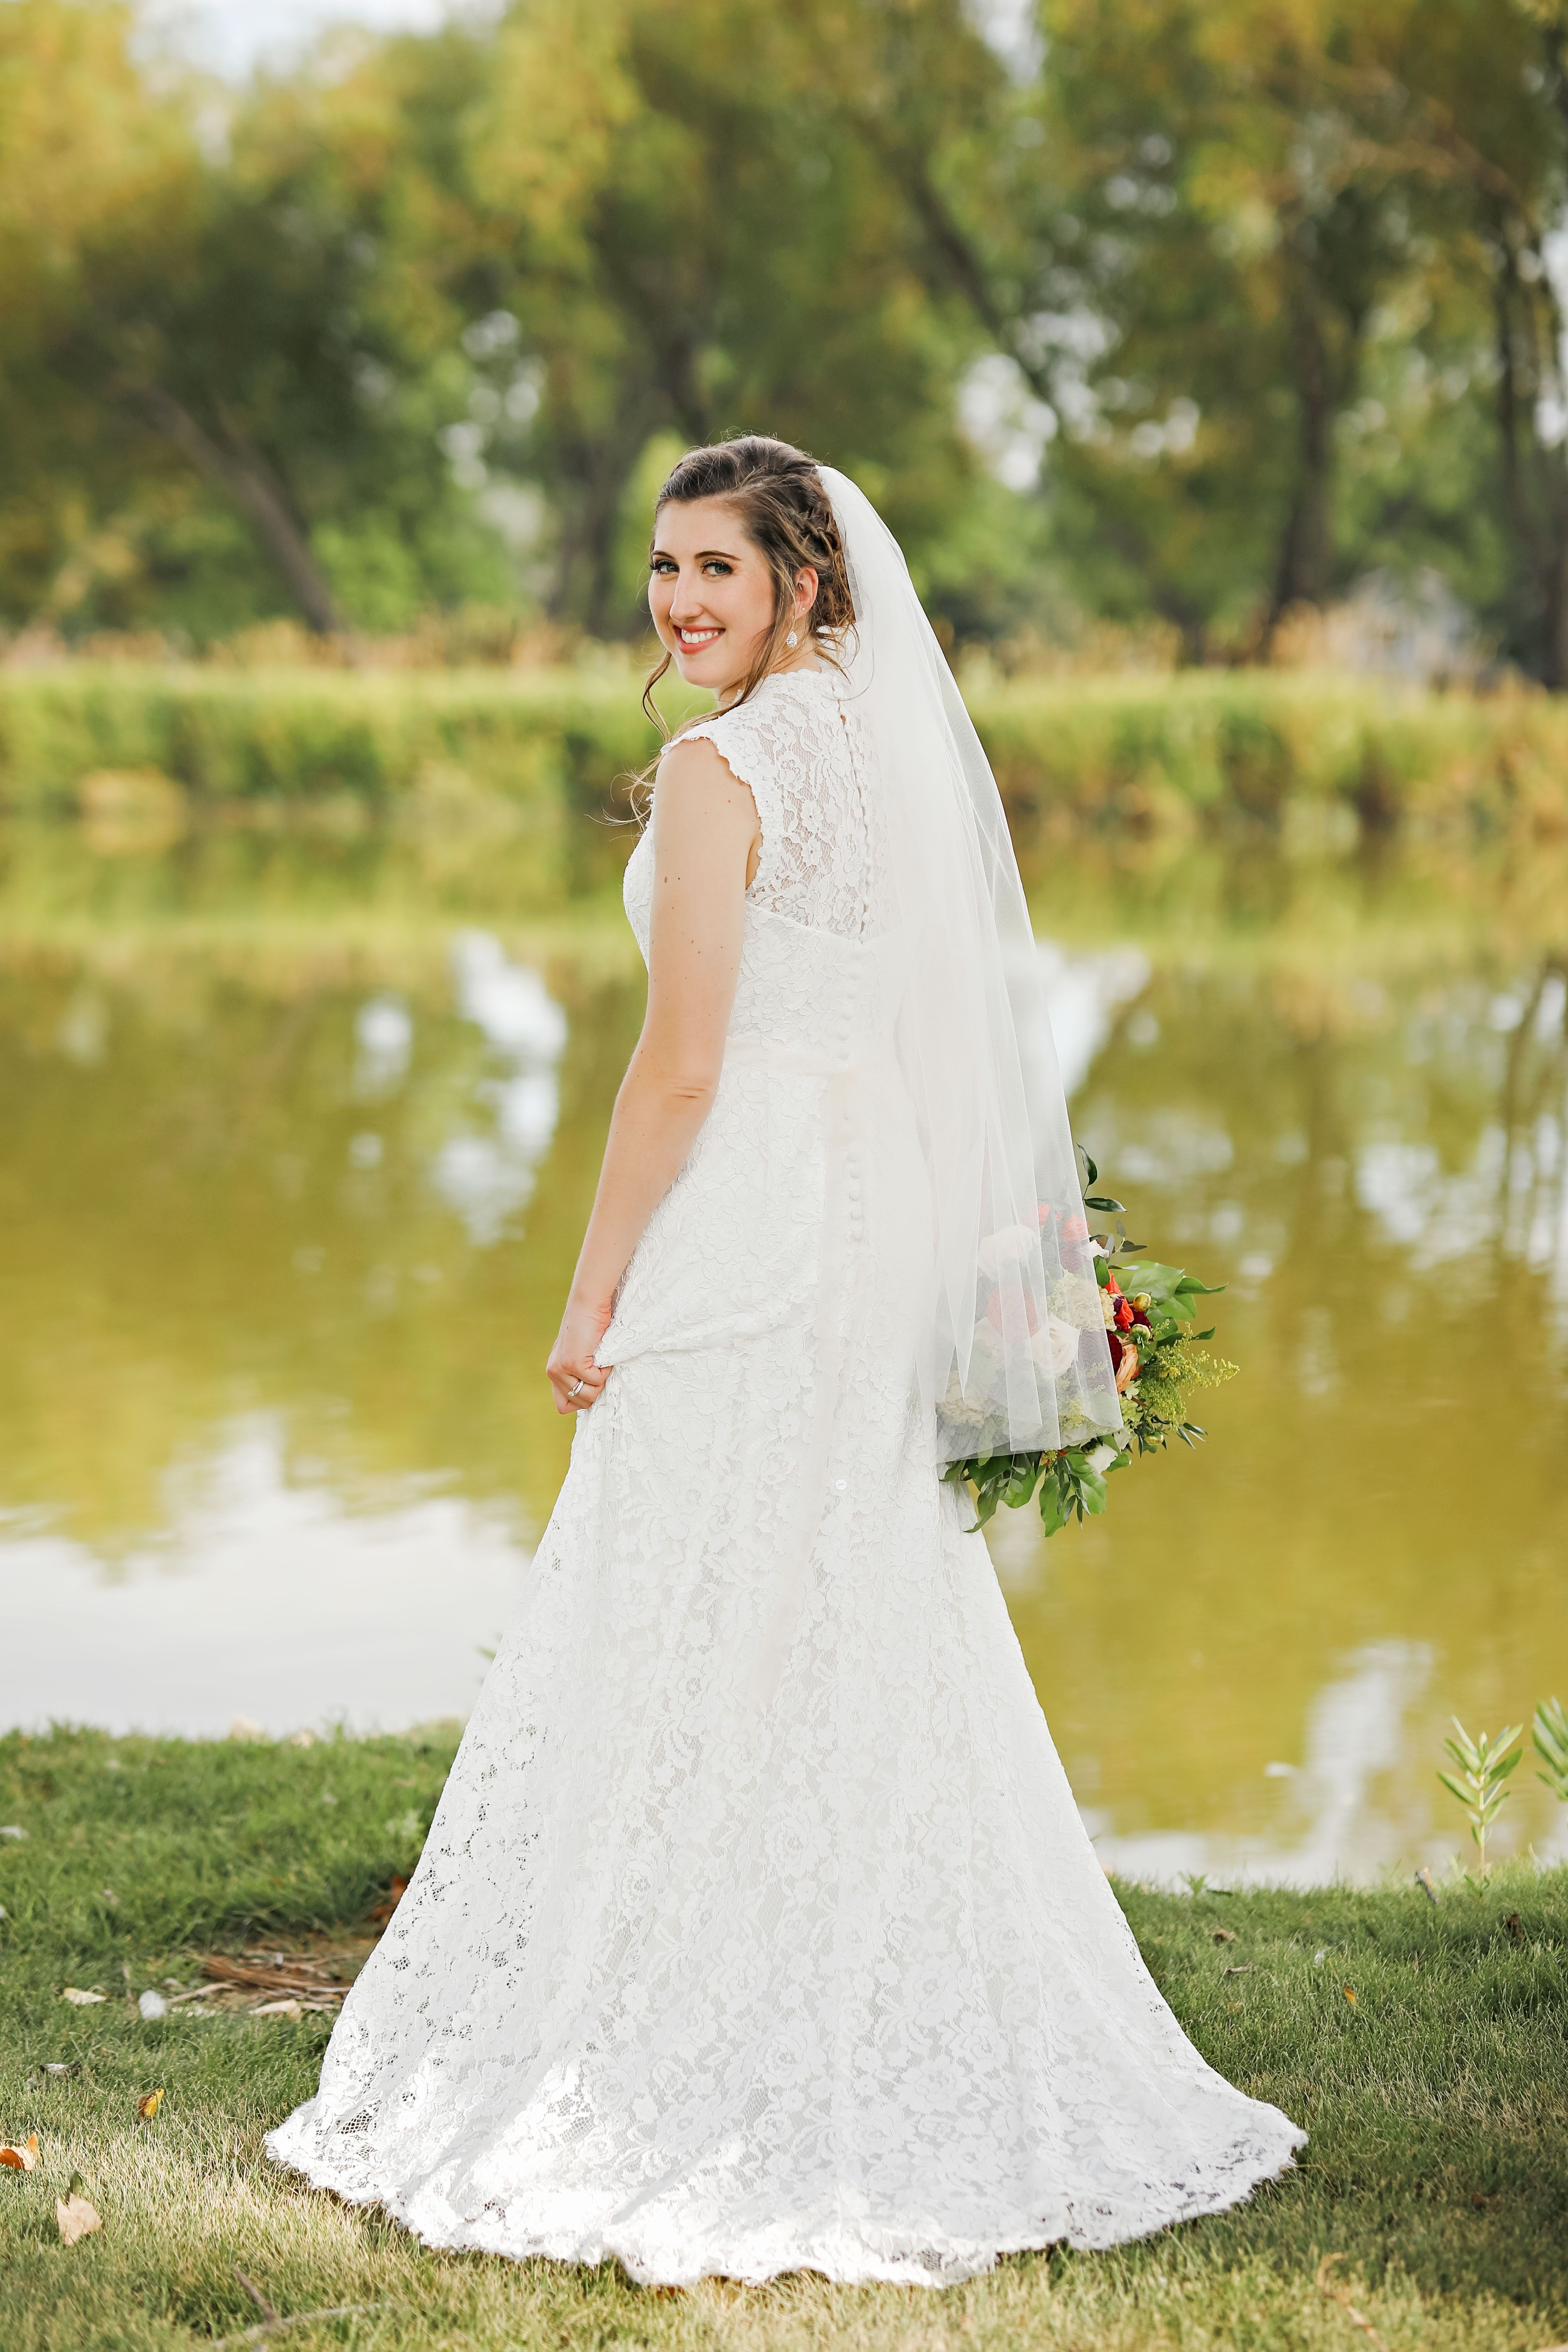 Wedding Photo Ideas Summer Wedding Photos Fall Wedding Photos Montana Wedding Photographer [ 6720 x 4480 Pixel ]